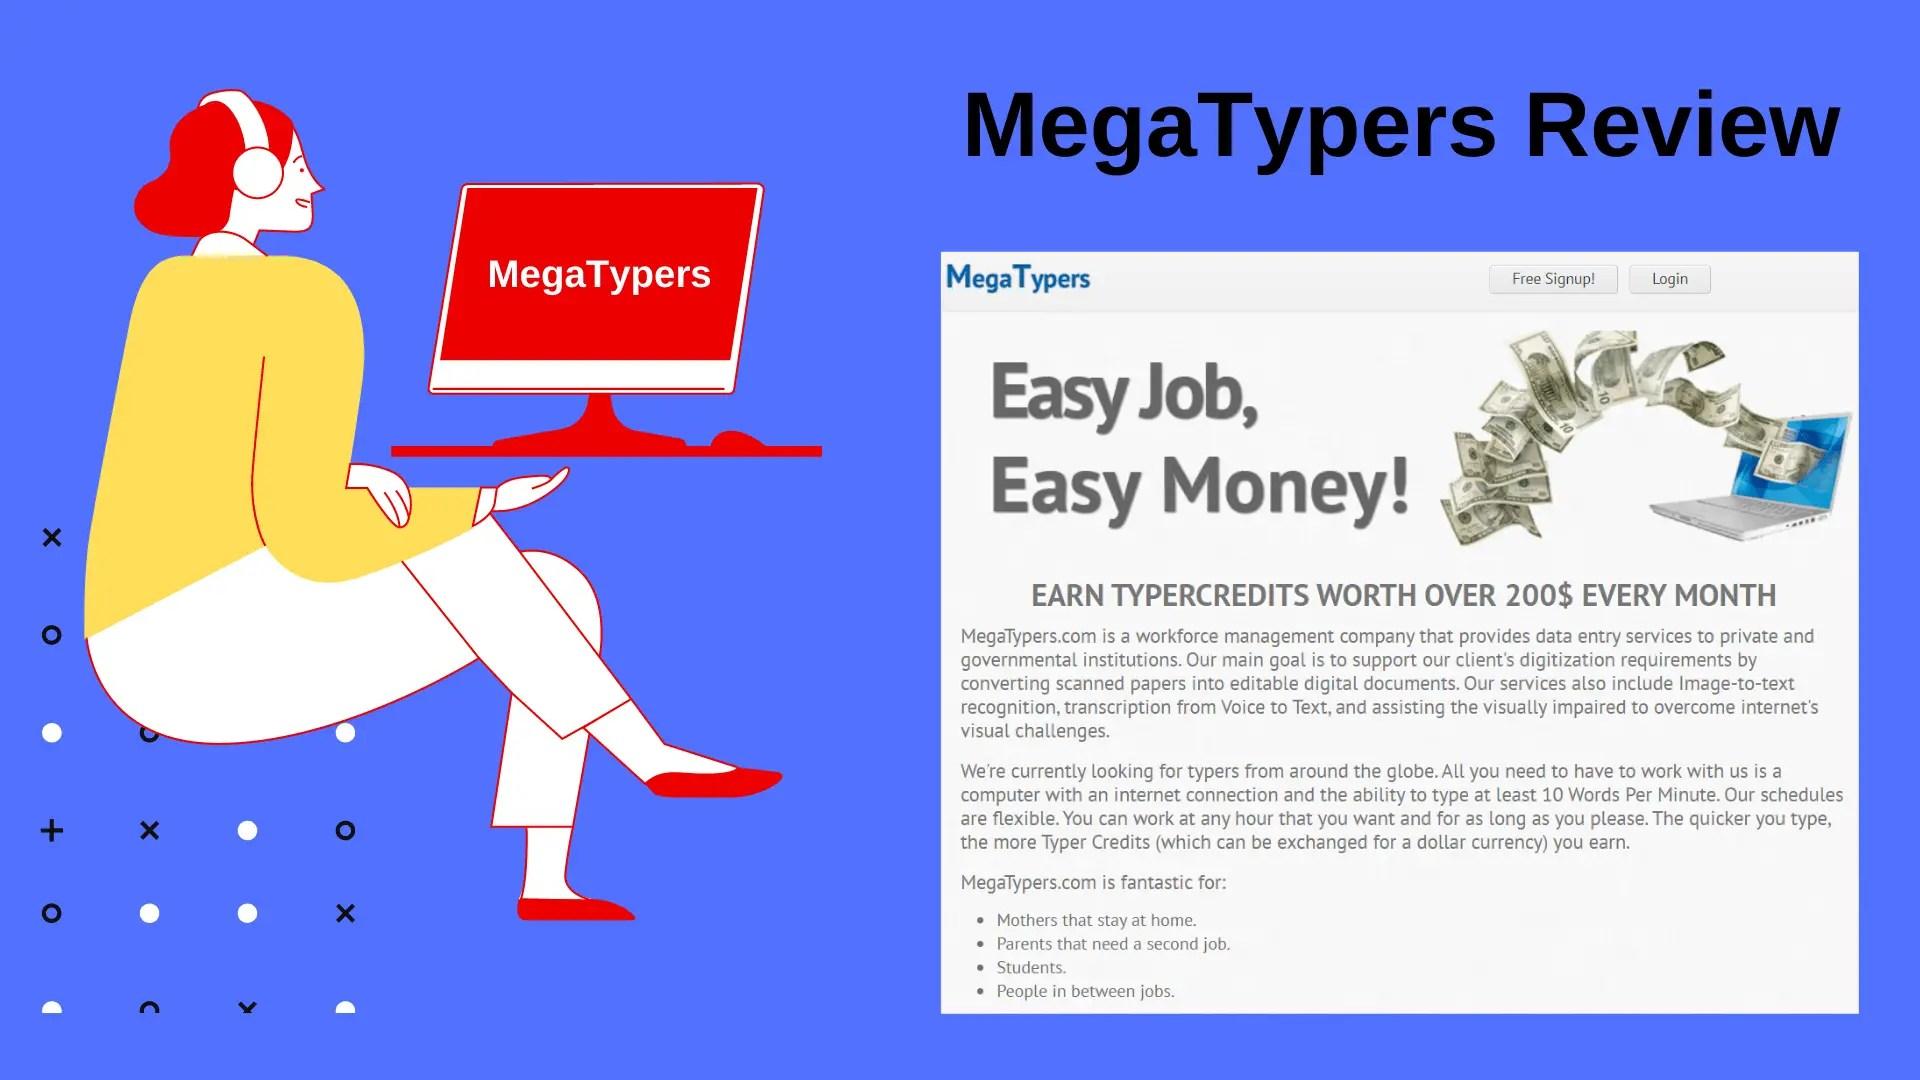 MegaTypers Review: Make Money Doing Captcha